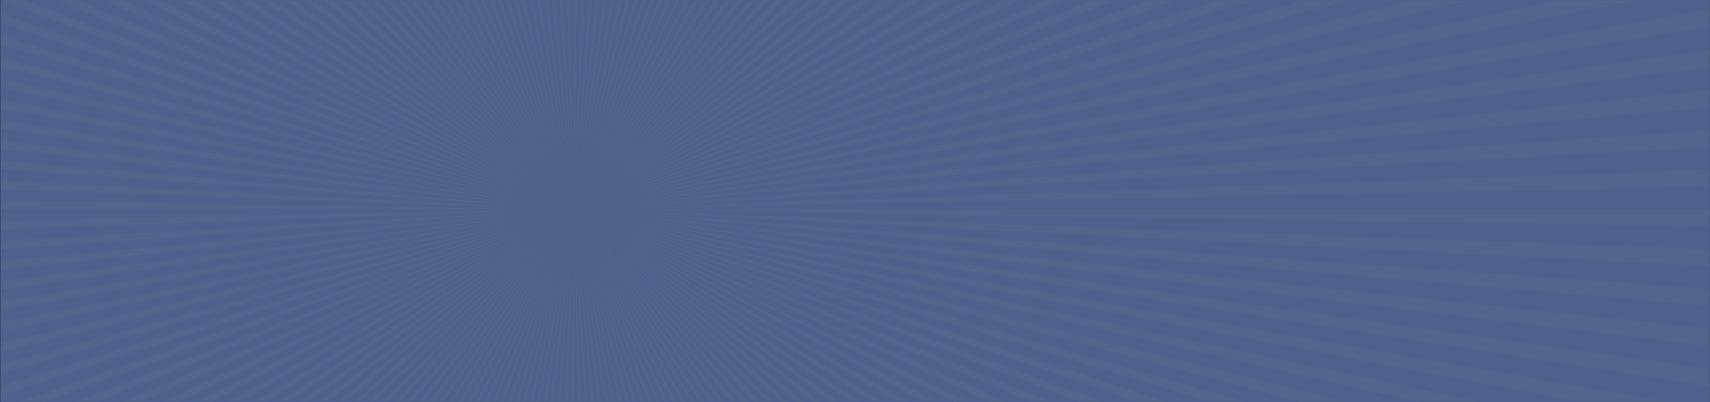 Xpertbrain Slider Background